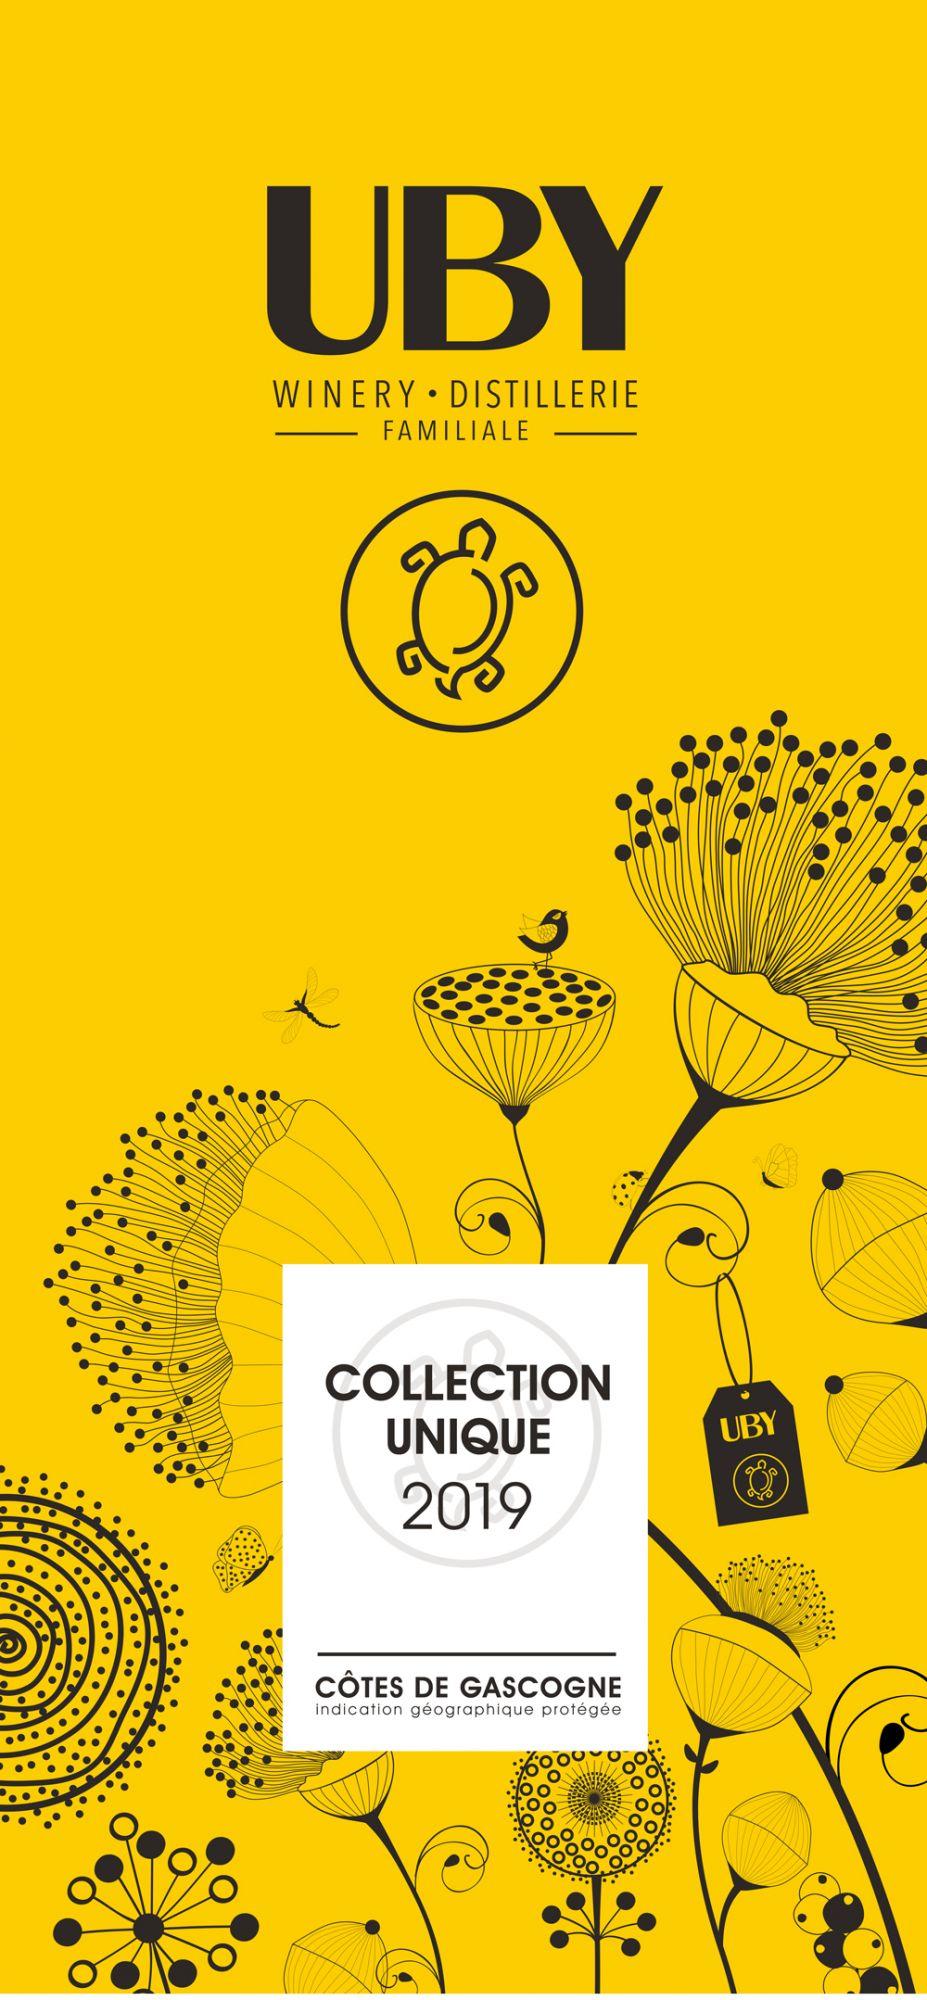 visuel-collection-unique-2019-blanc-uby